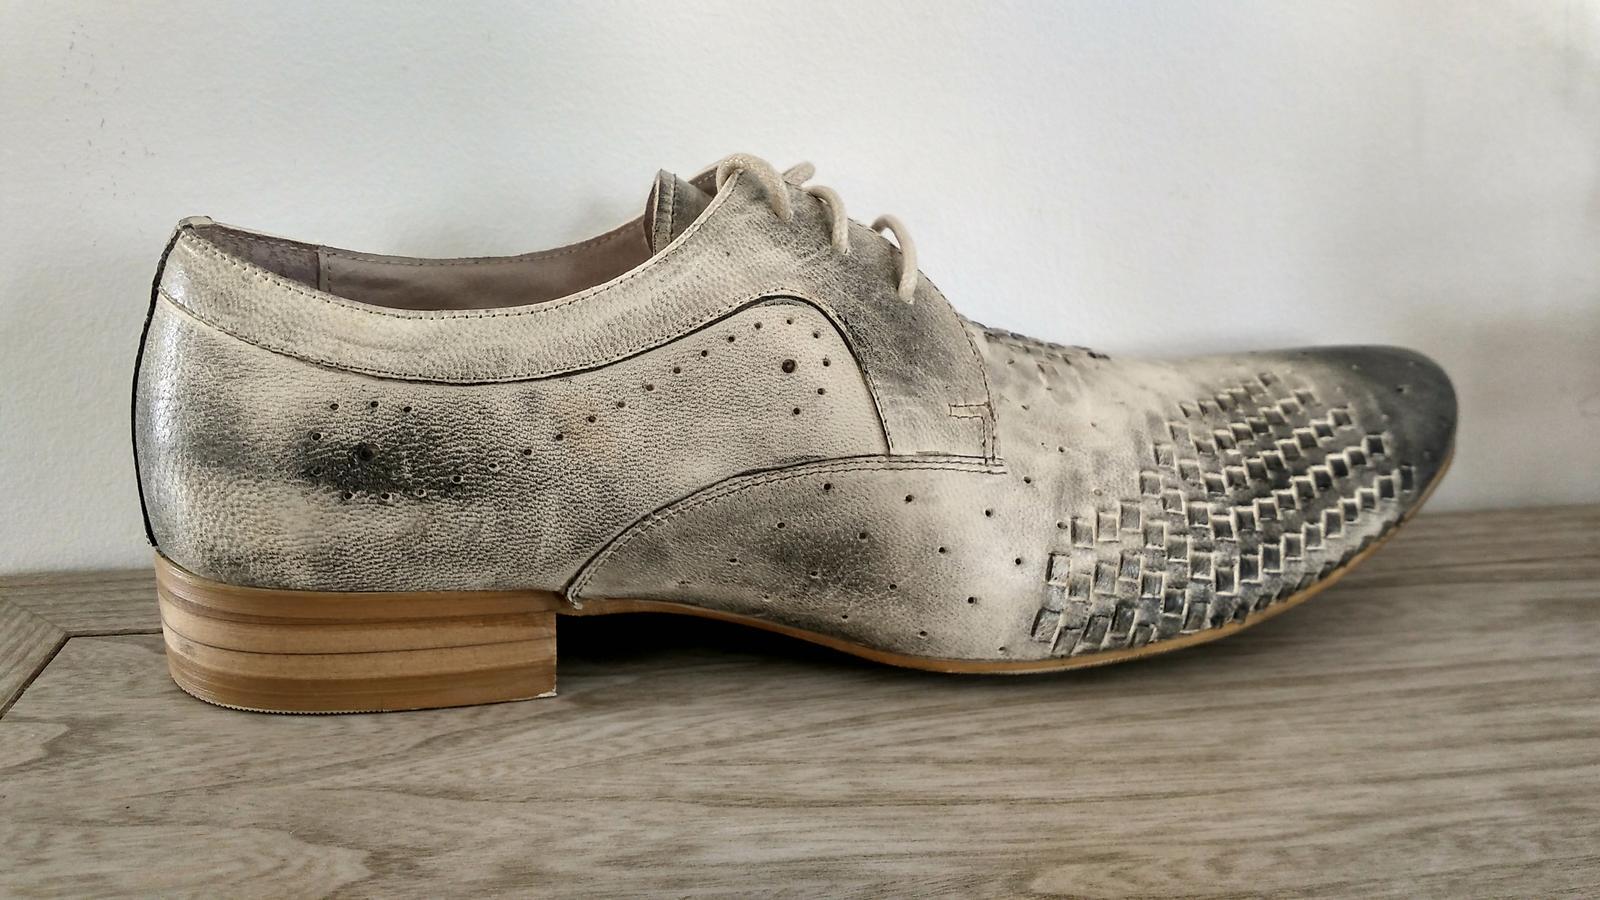 Pánske spoločenské topánky - Obrázok č. 3